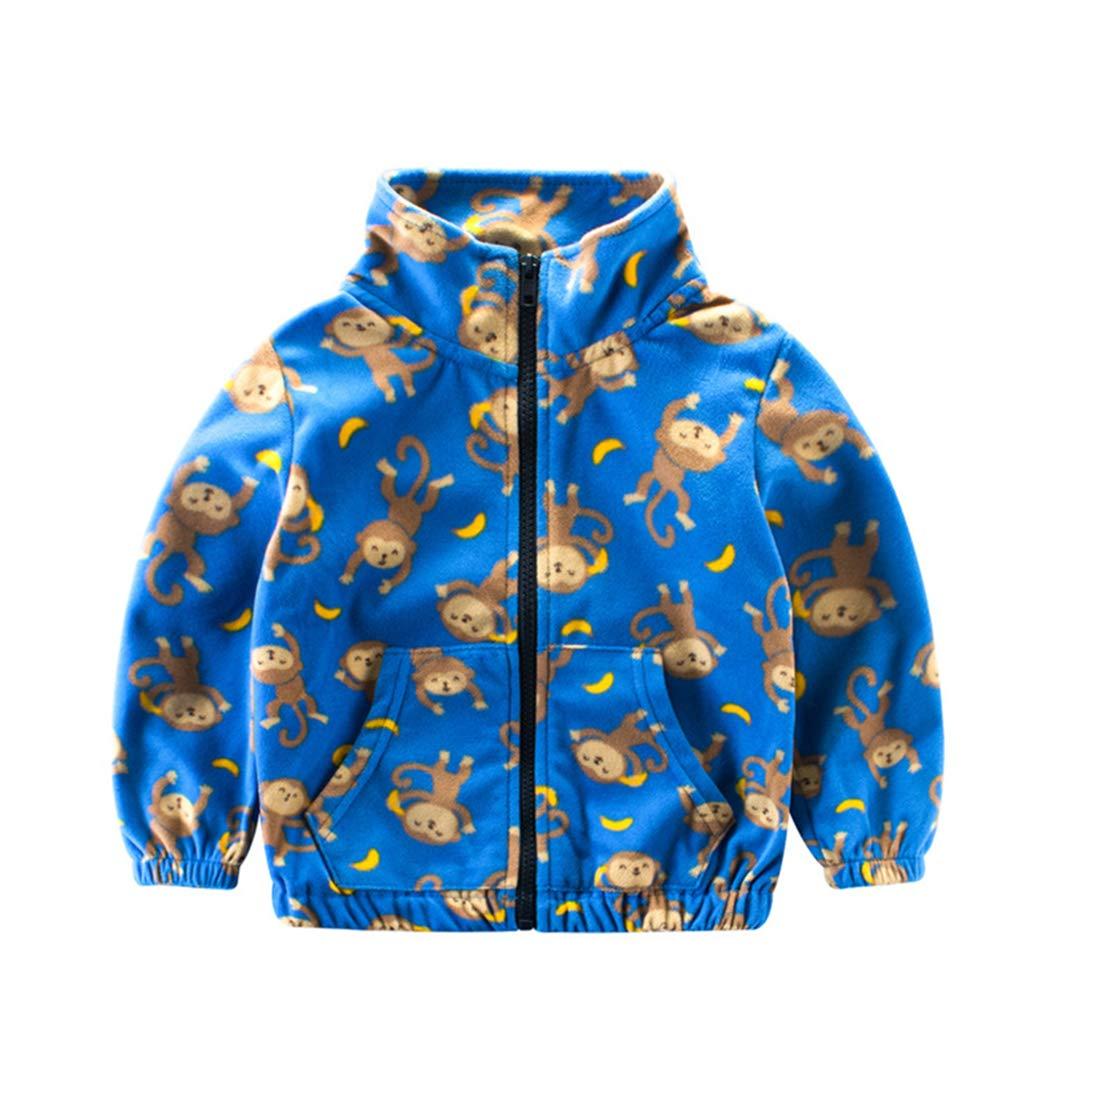 AIKSSOO Kid Casual Outerwear Toddler Boy Fleece Coat Monkey Print Zip Front Jacket